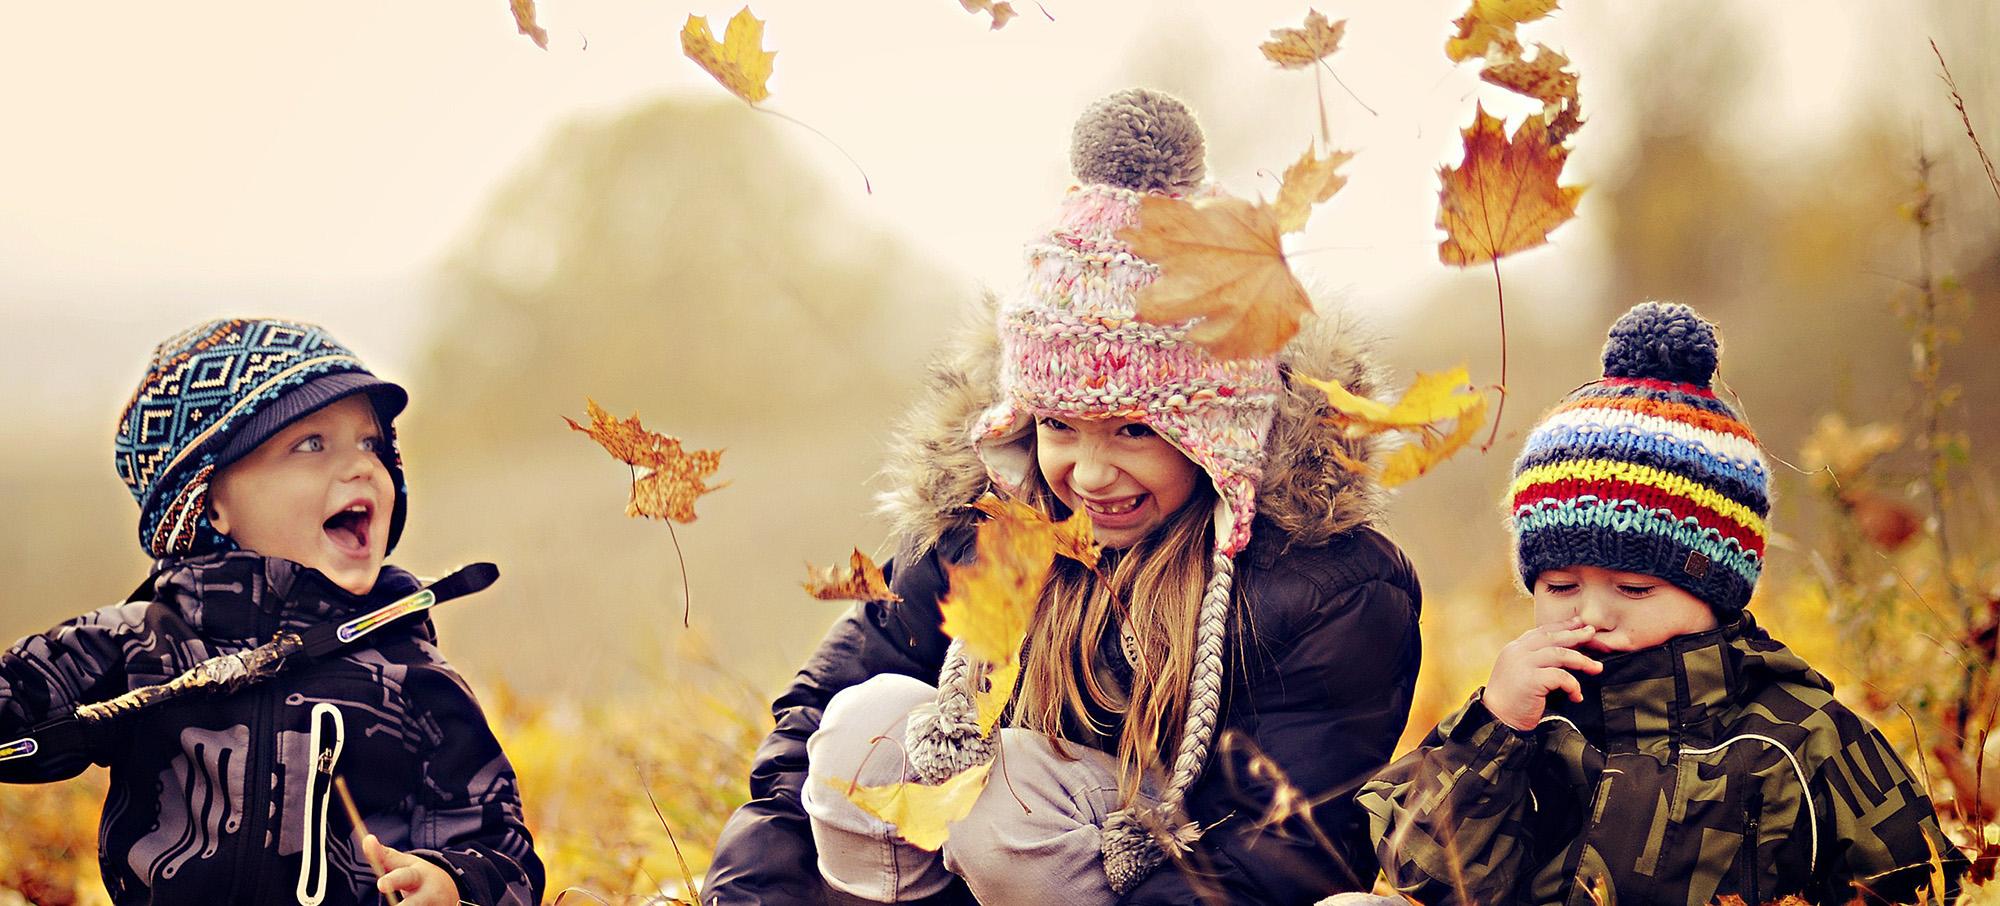 happy-kids-nature-autumn-leaves-photo-wallpaper-2000